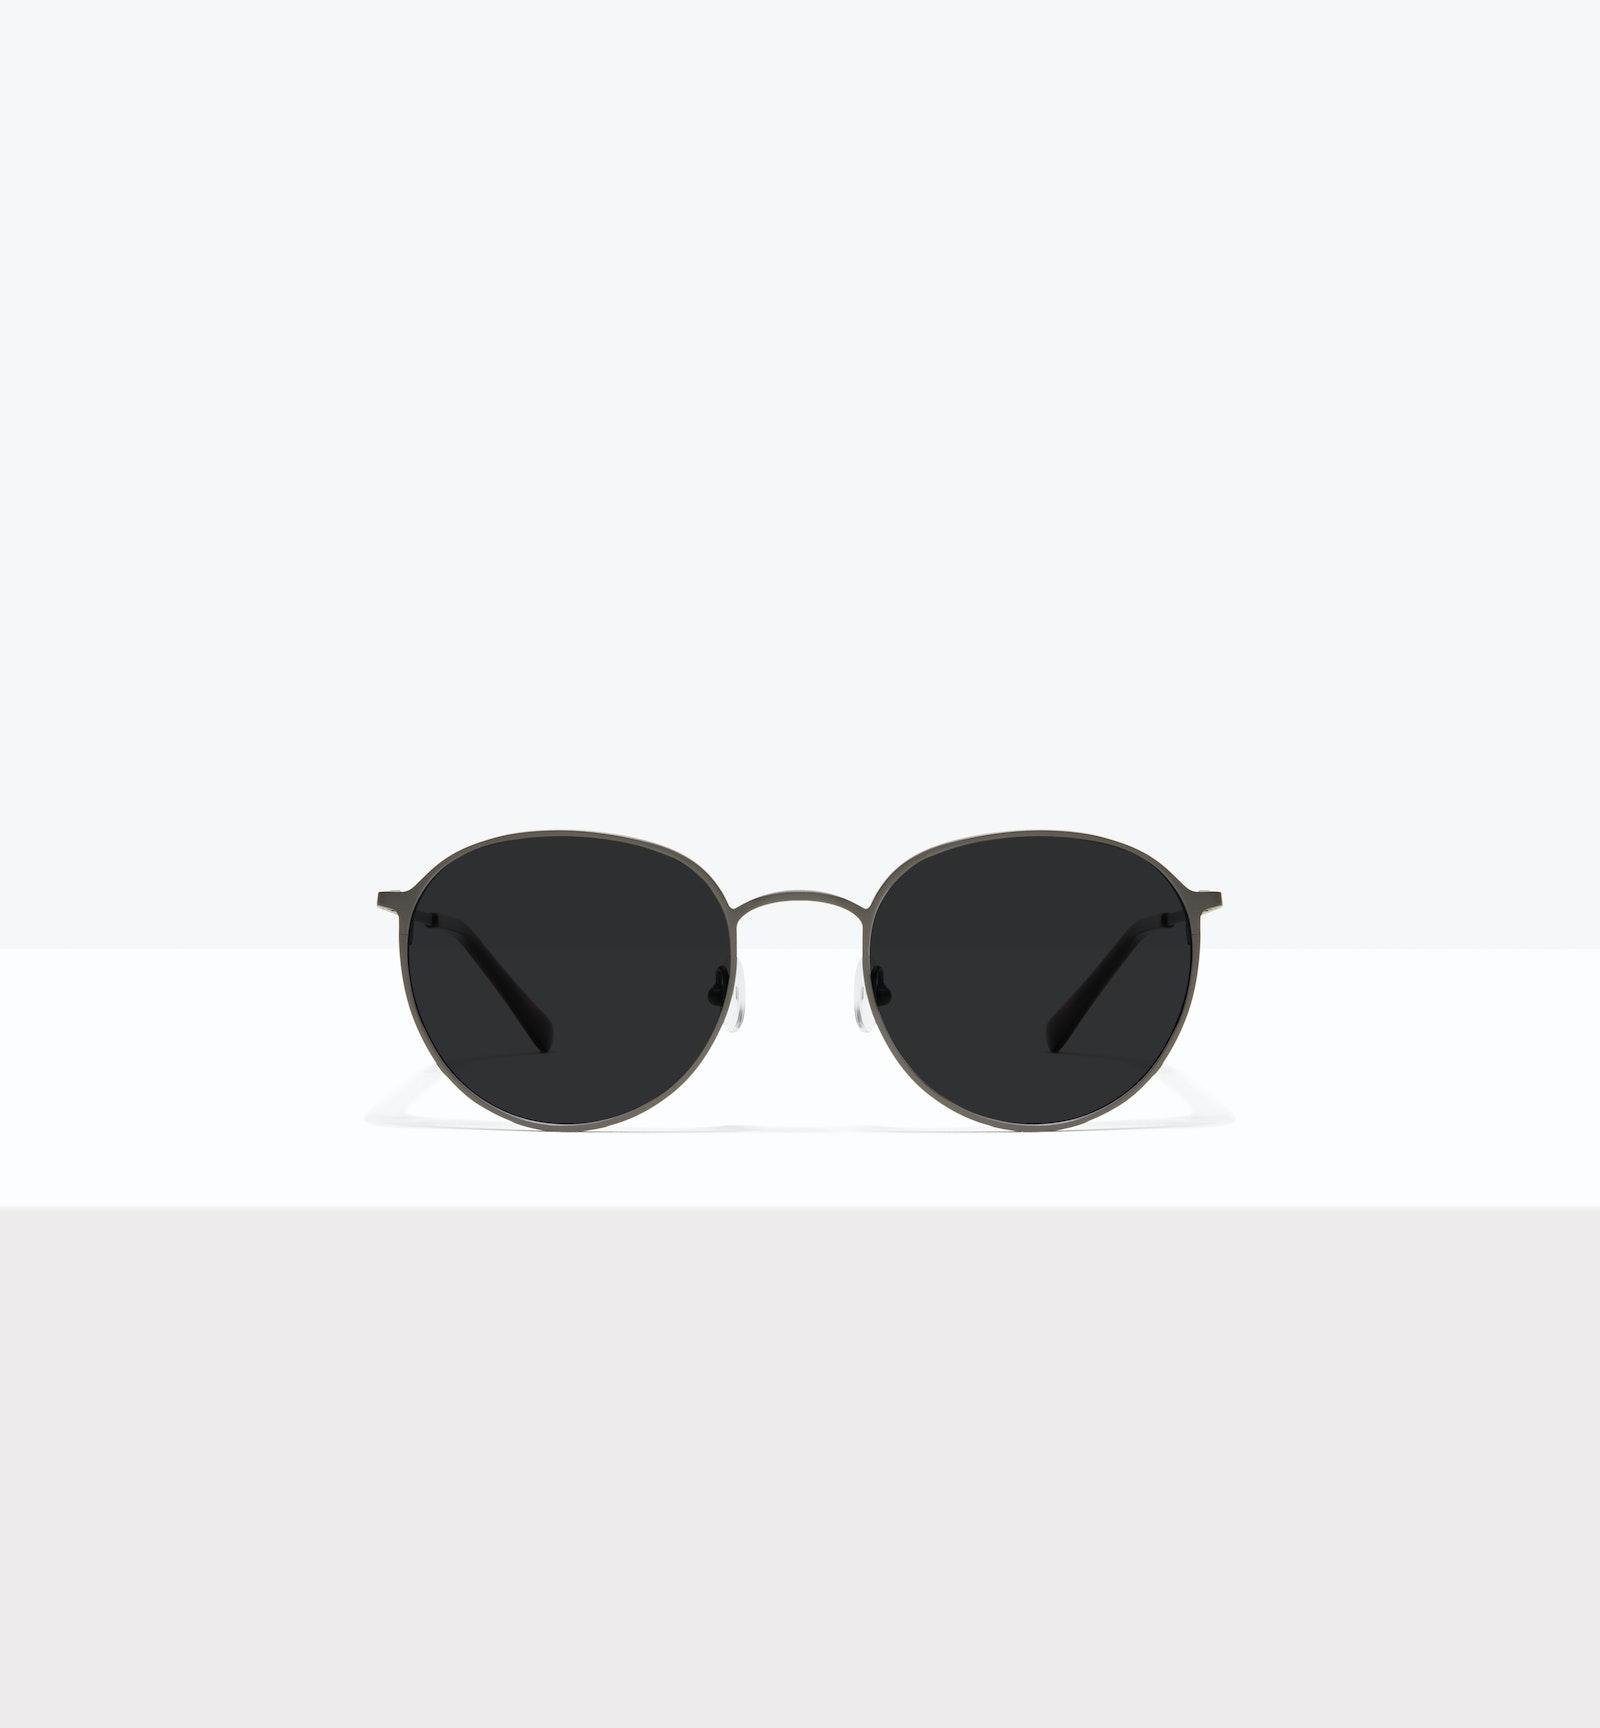 Affordable Fashion Glasses Round Sunglasses Men Ridge Carbon